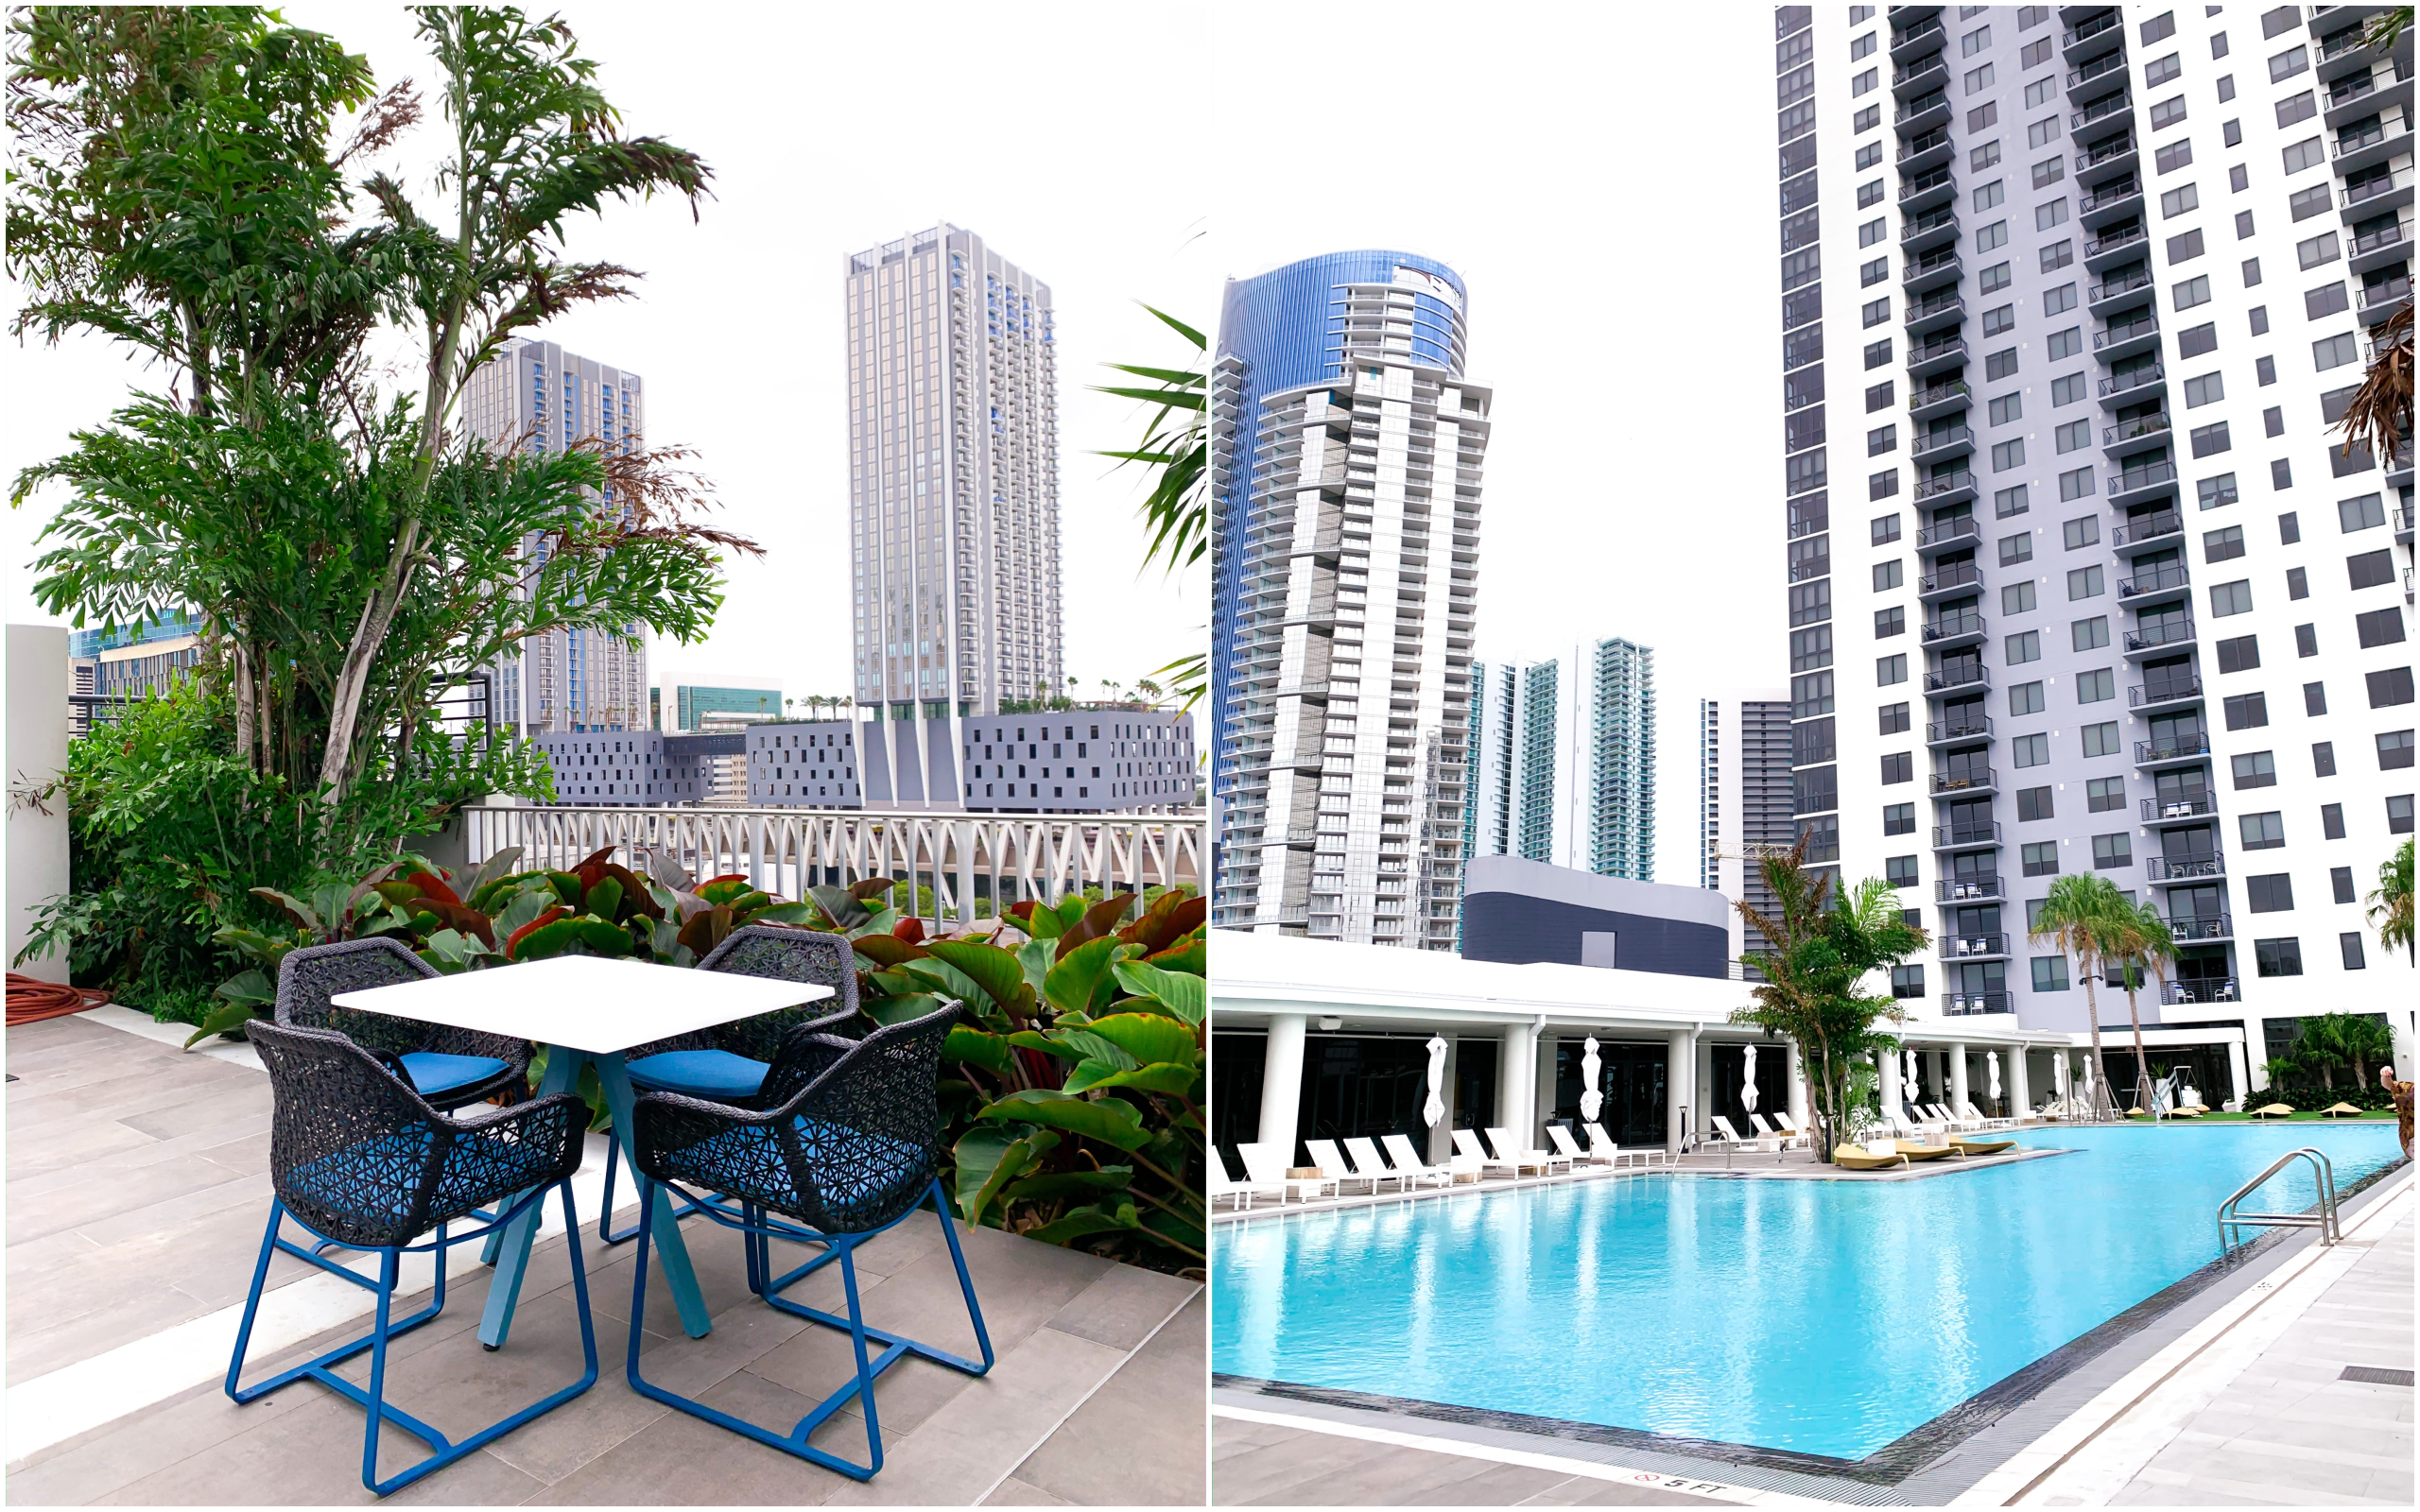 Miami blogger Krista Perez shares her Stay at Domio